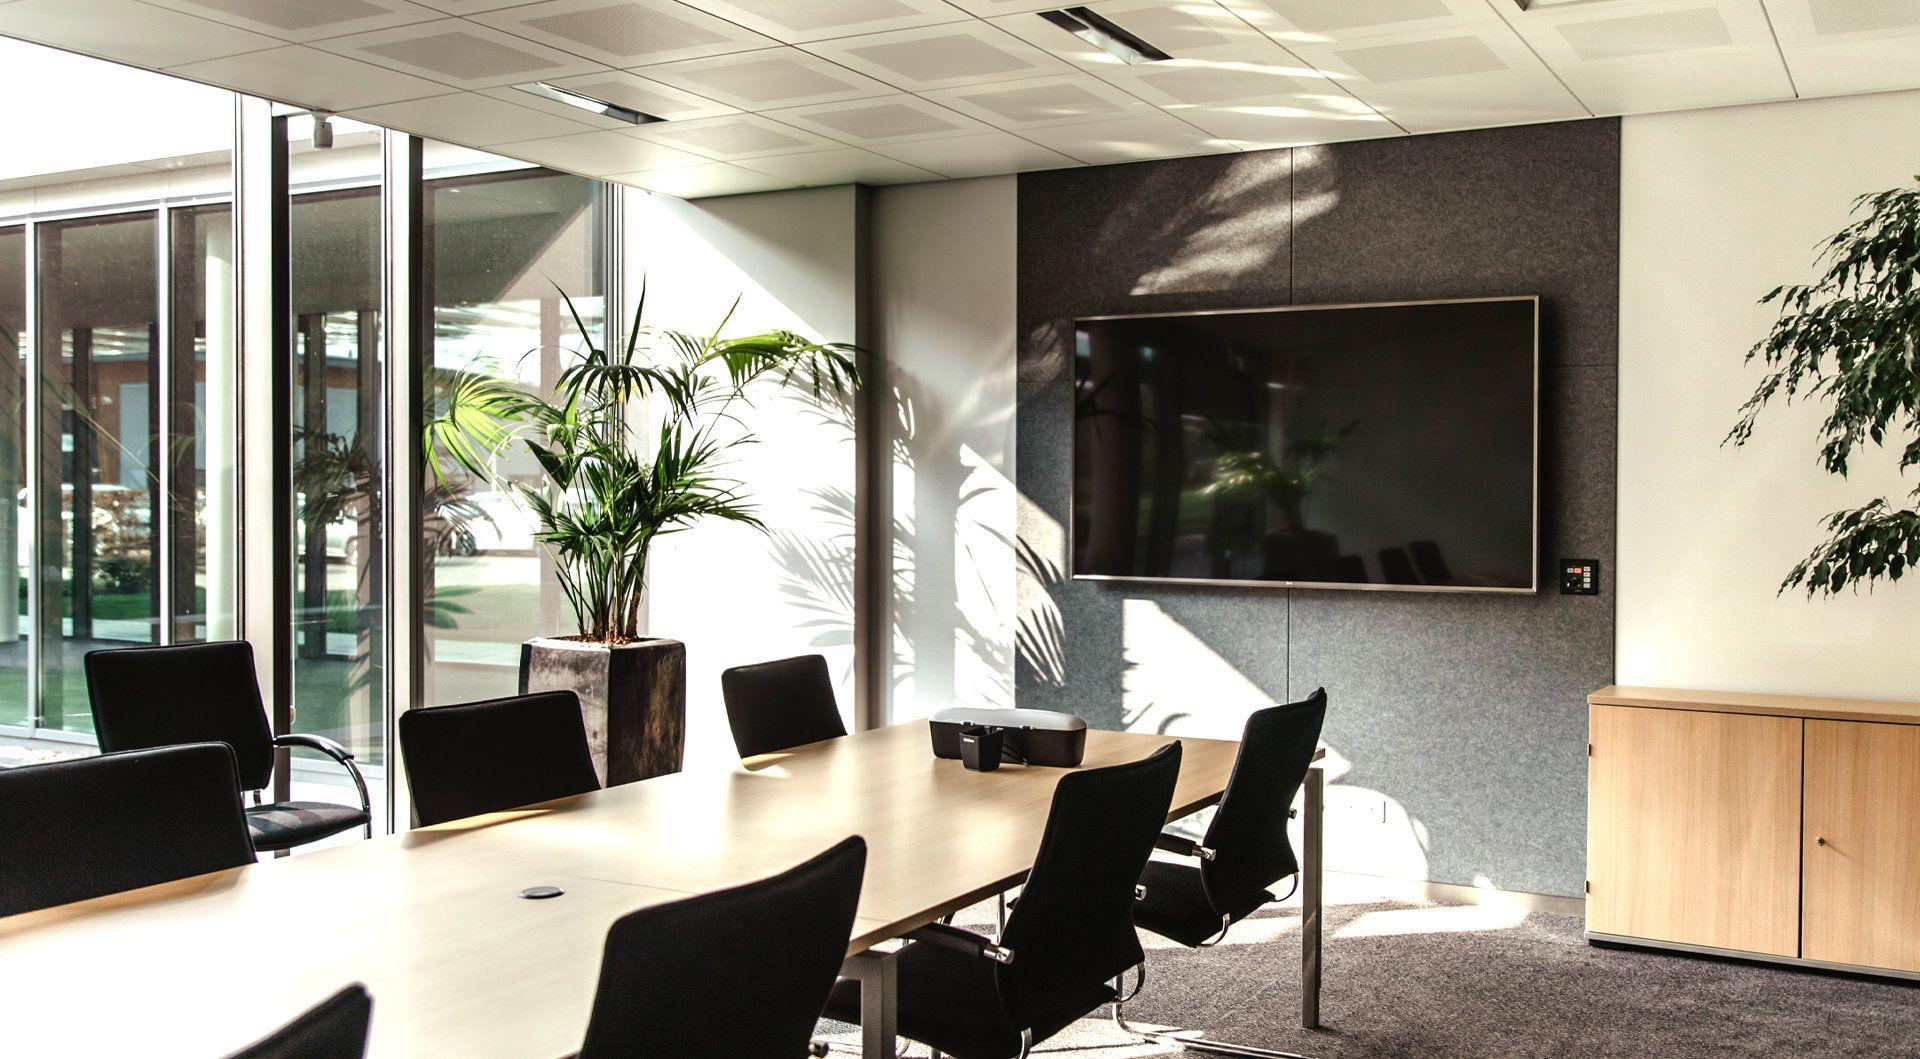 Sony VPL-FHZ70 beamer/projector Desktopprojector 5500 ANSI lumens 3LCD WUXGA (1920x1200) Zwart, Wit - Case studie de vries